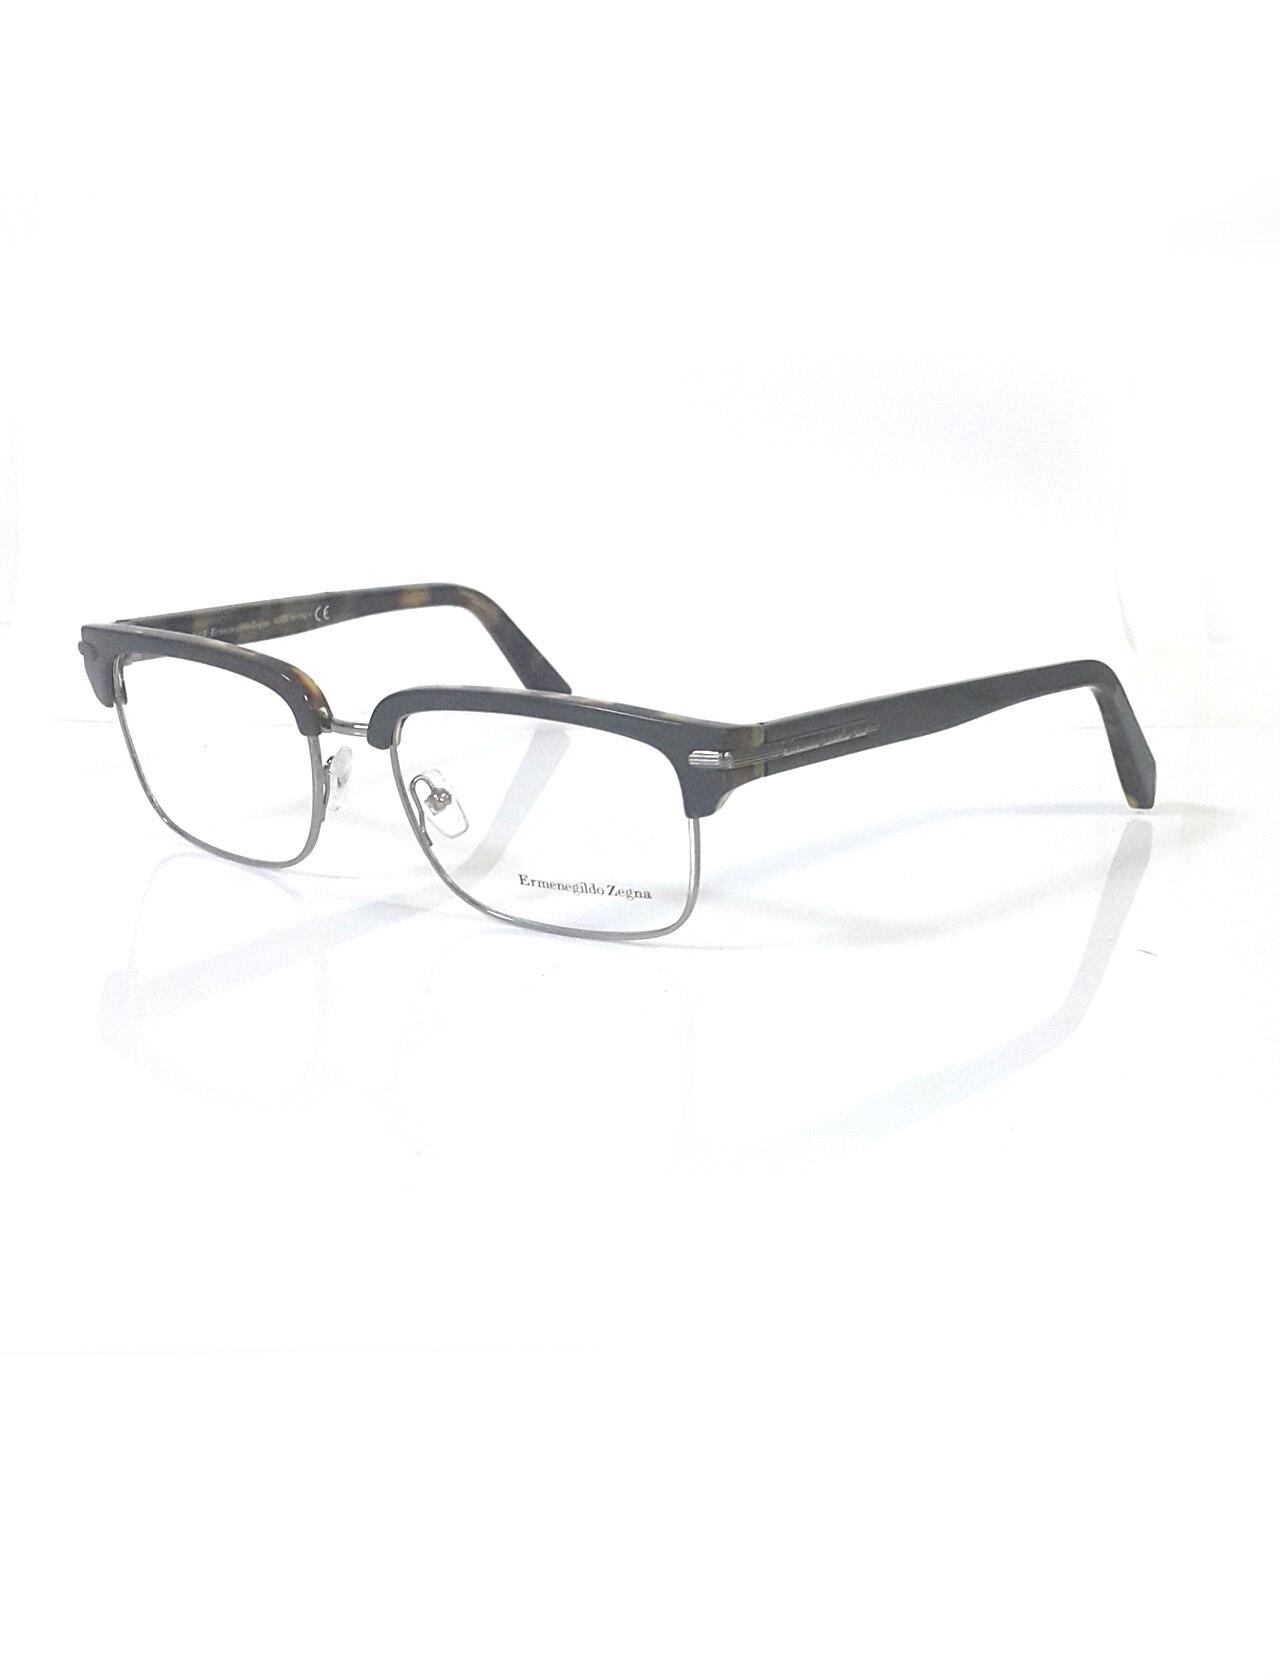 Markamilla Unisex Reading Glasses Frame Demo Glasses Eyewear Transparent High Quality Women MenErmenegildo Zegna EZ 5034 020